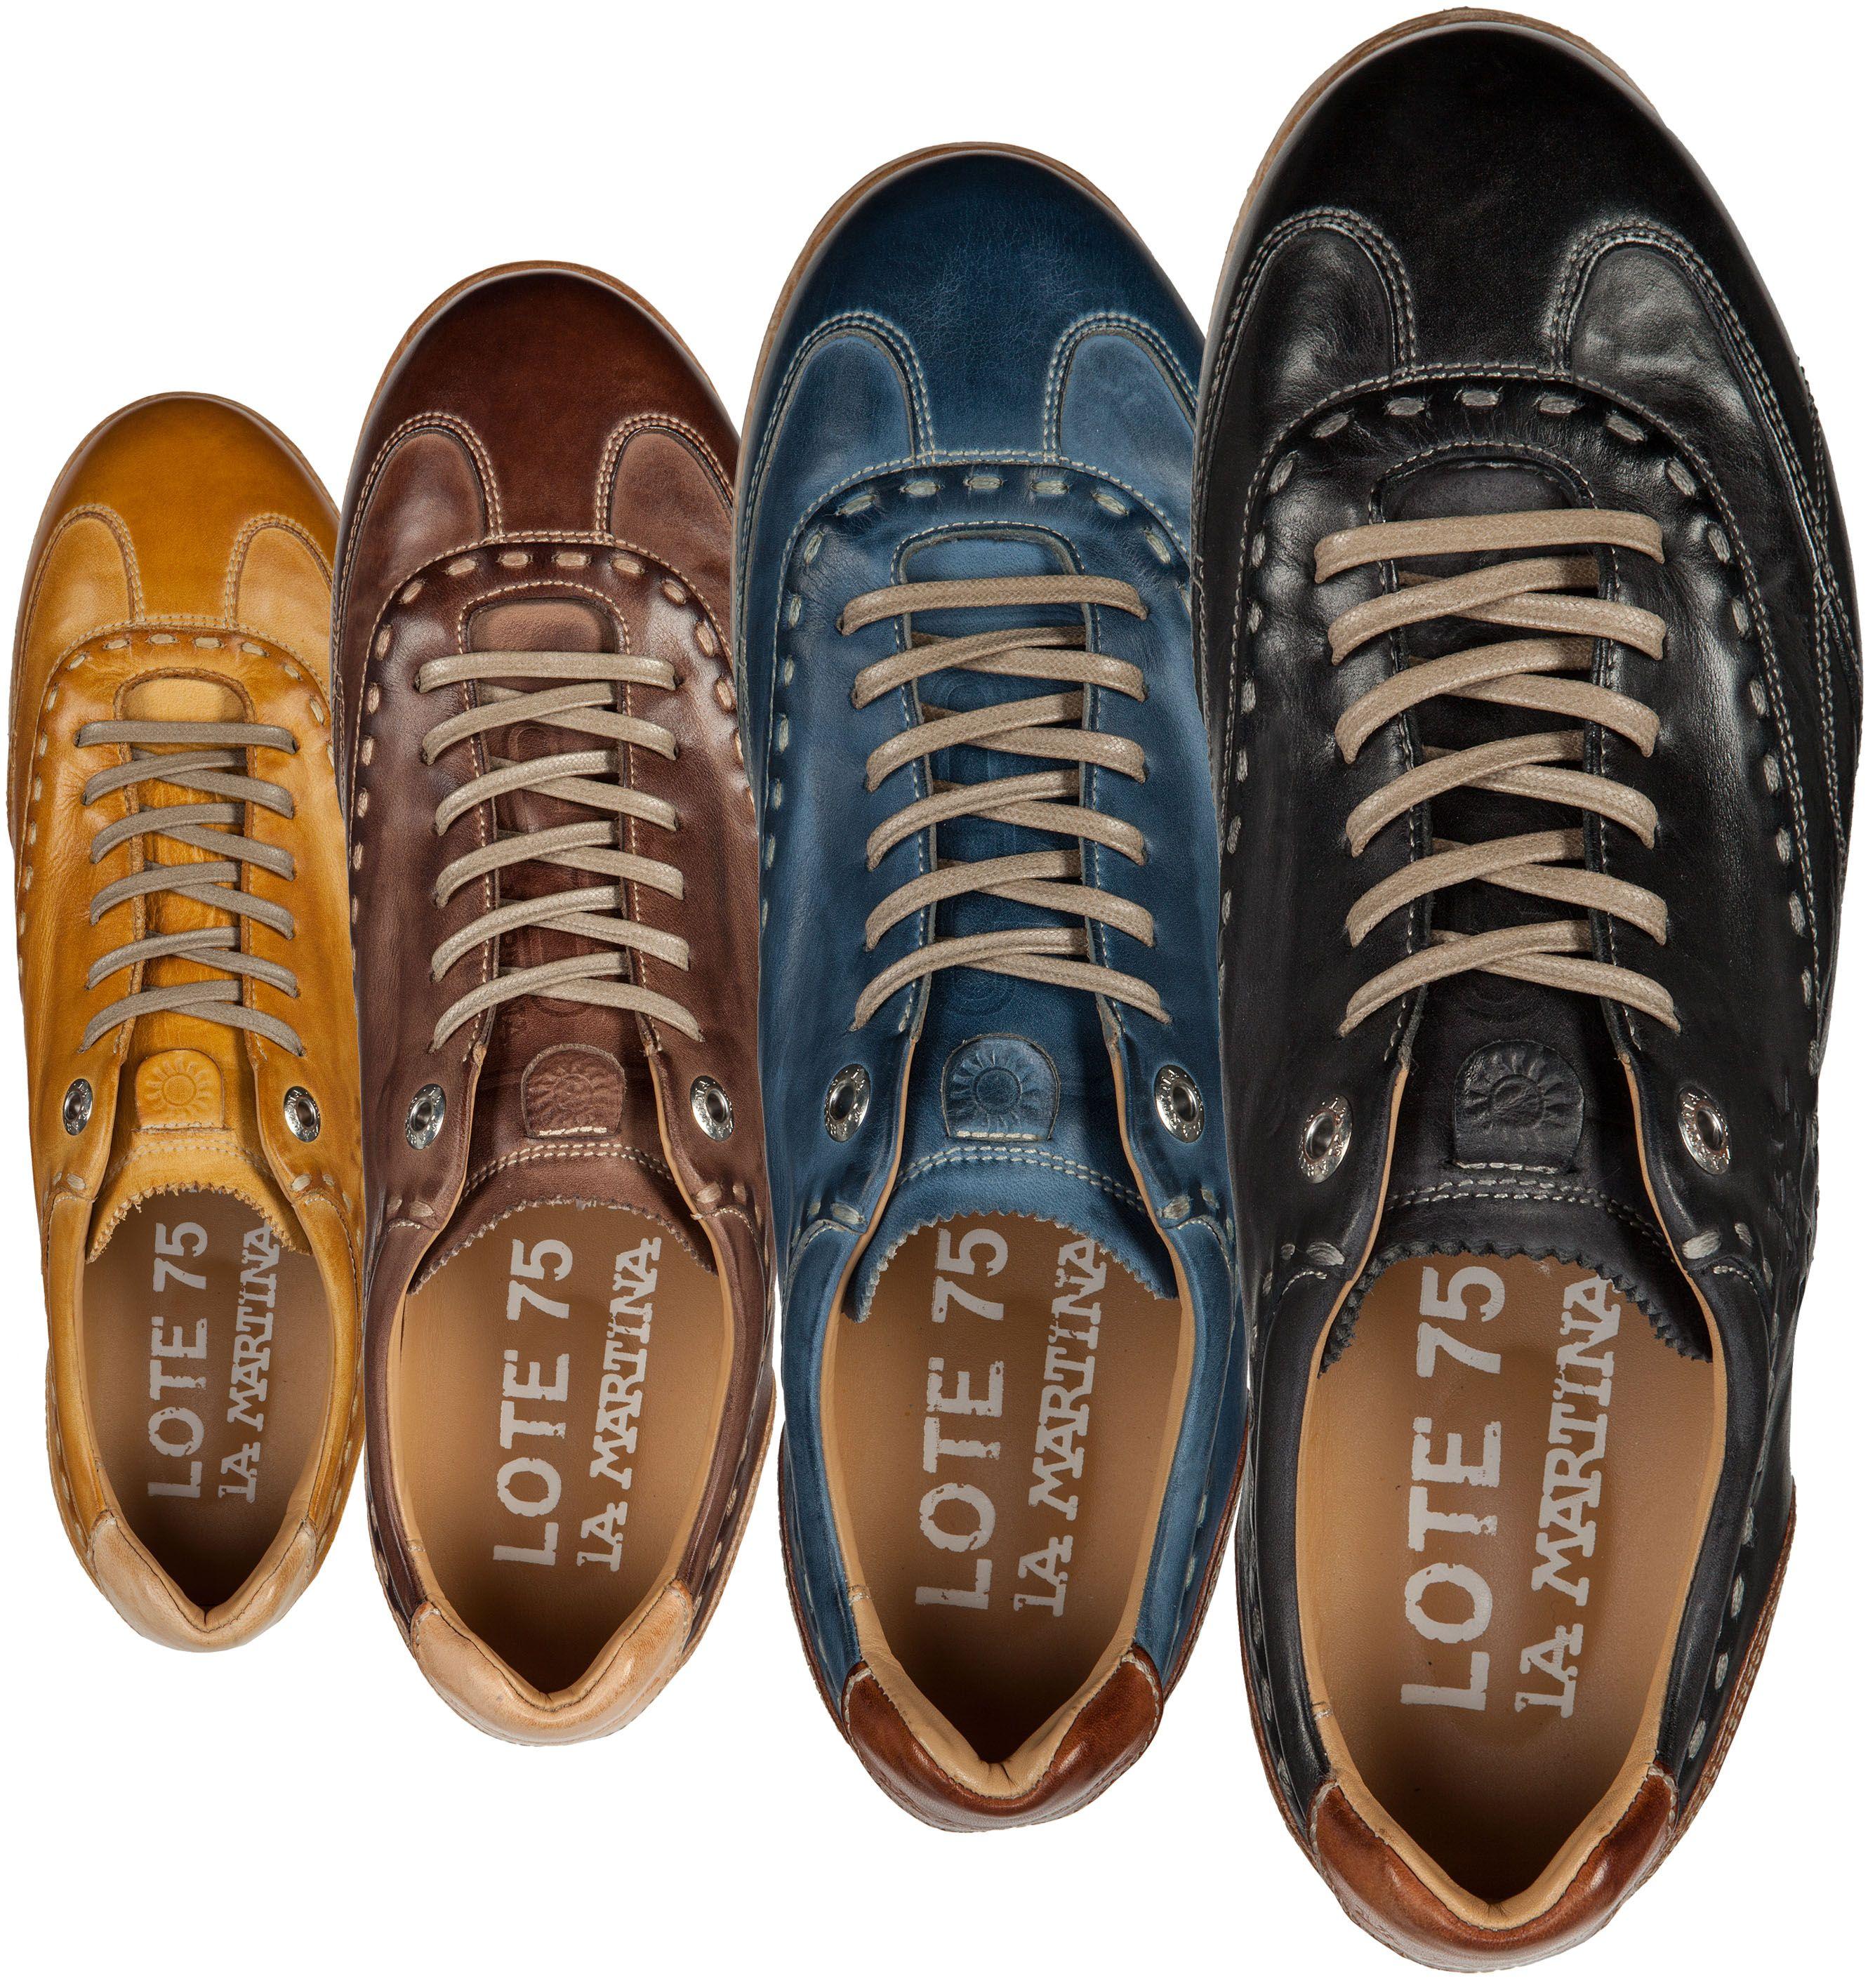 sports shoes 7b55e d47d2 Pin von Fashionist auf Shoes & Boots in 2019 | Schuhe online ...